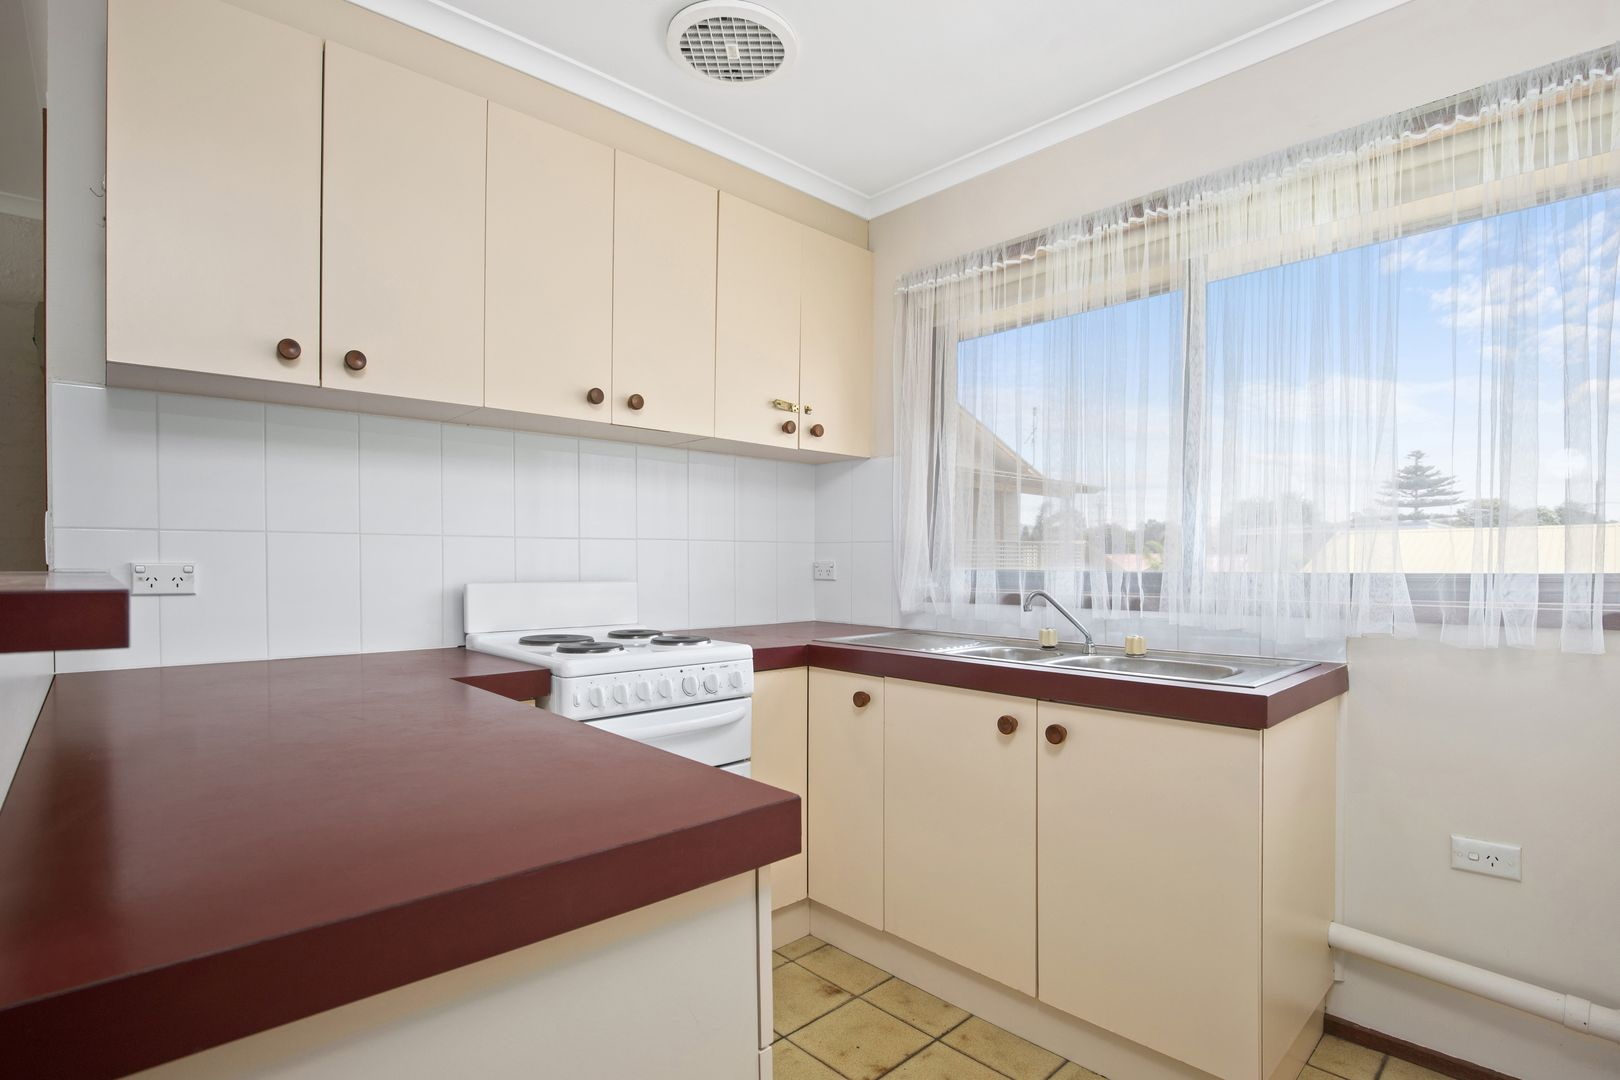 2/5 Avalon Street, Batemans Bay NSW 2536, Image 1